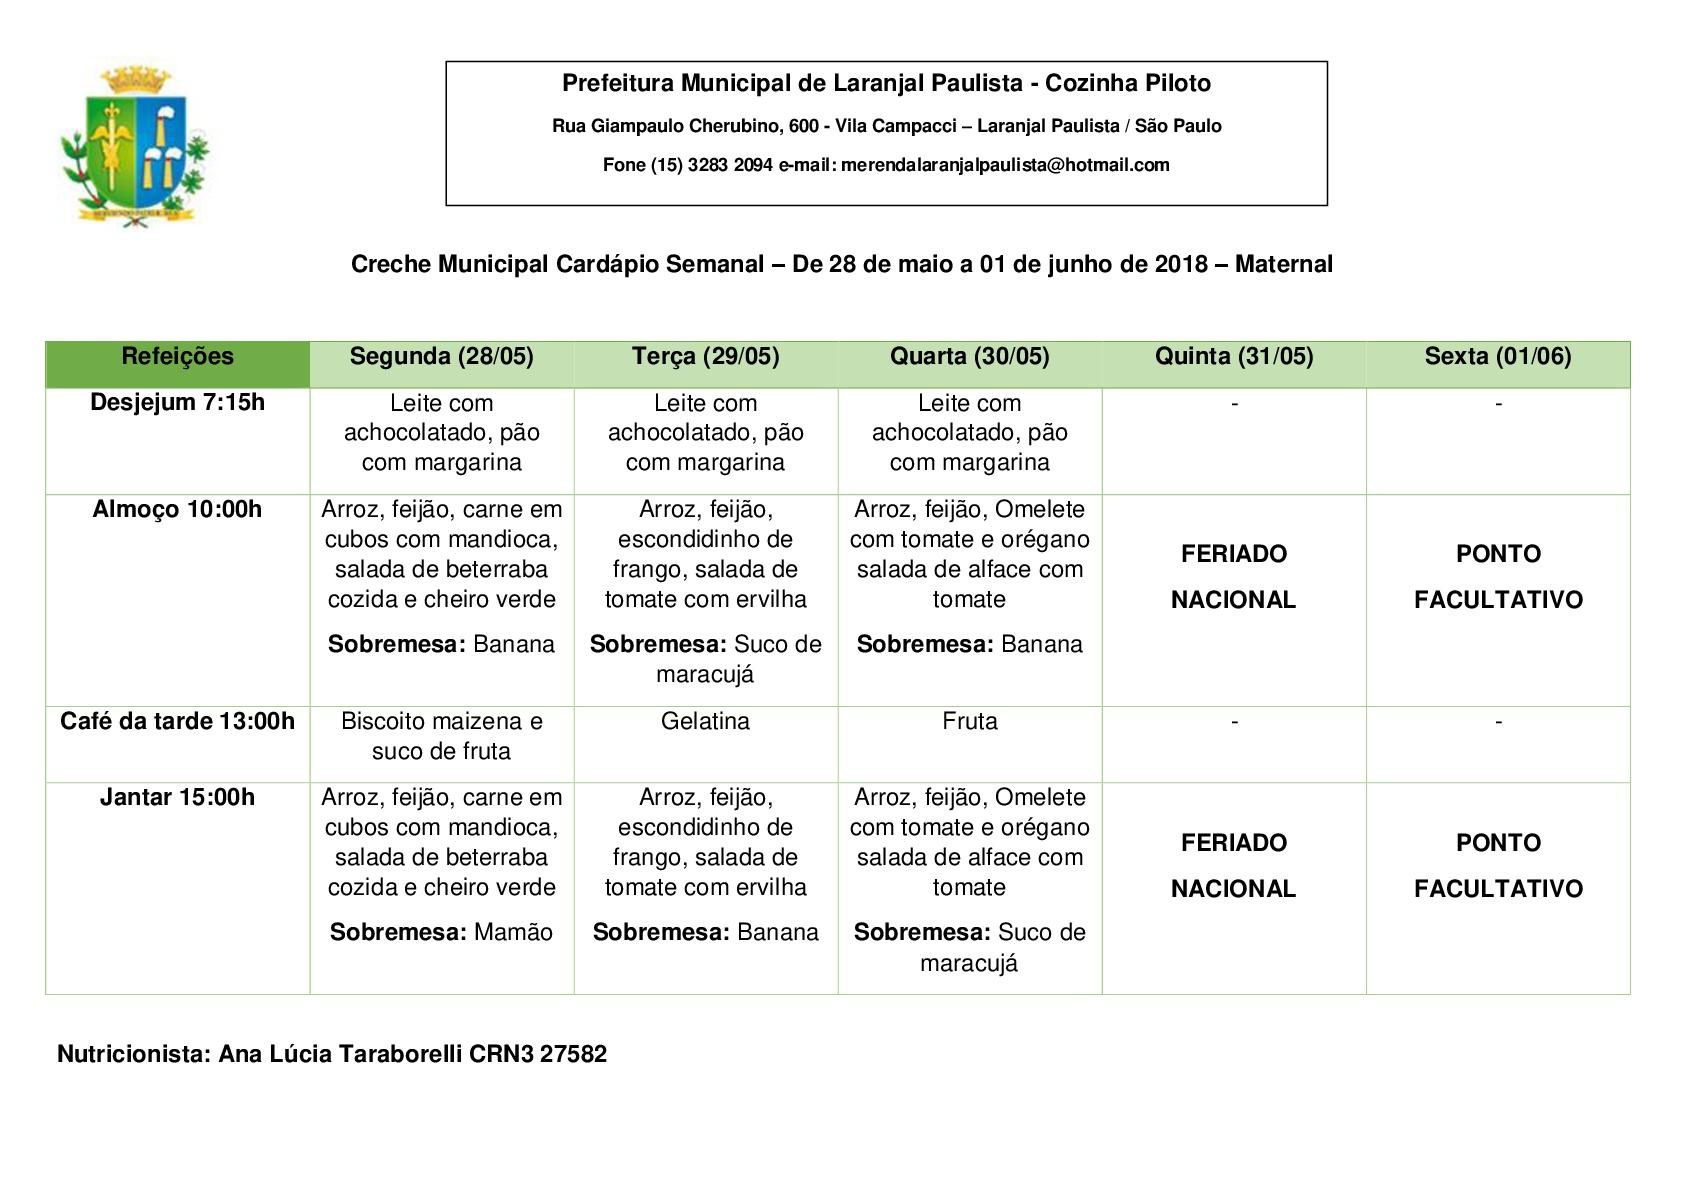 Cardápios da merenda para o mês de Maio das Escolas e Creches de Laranjal Paulista.